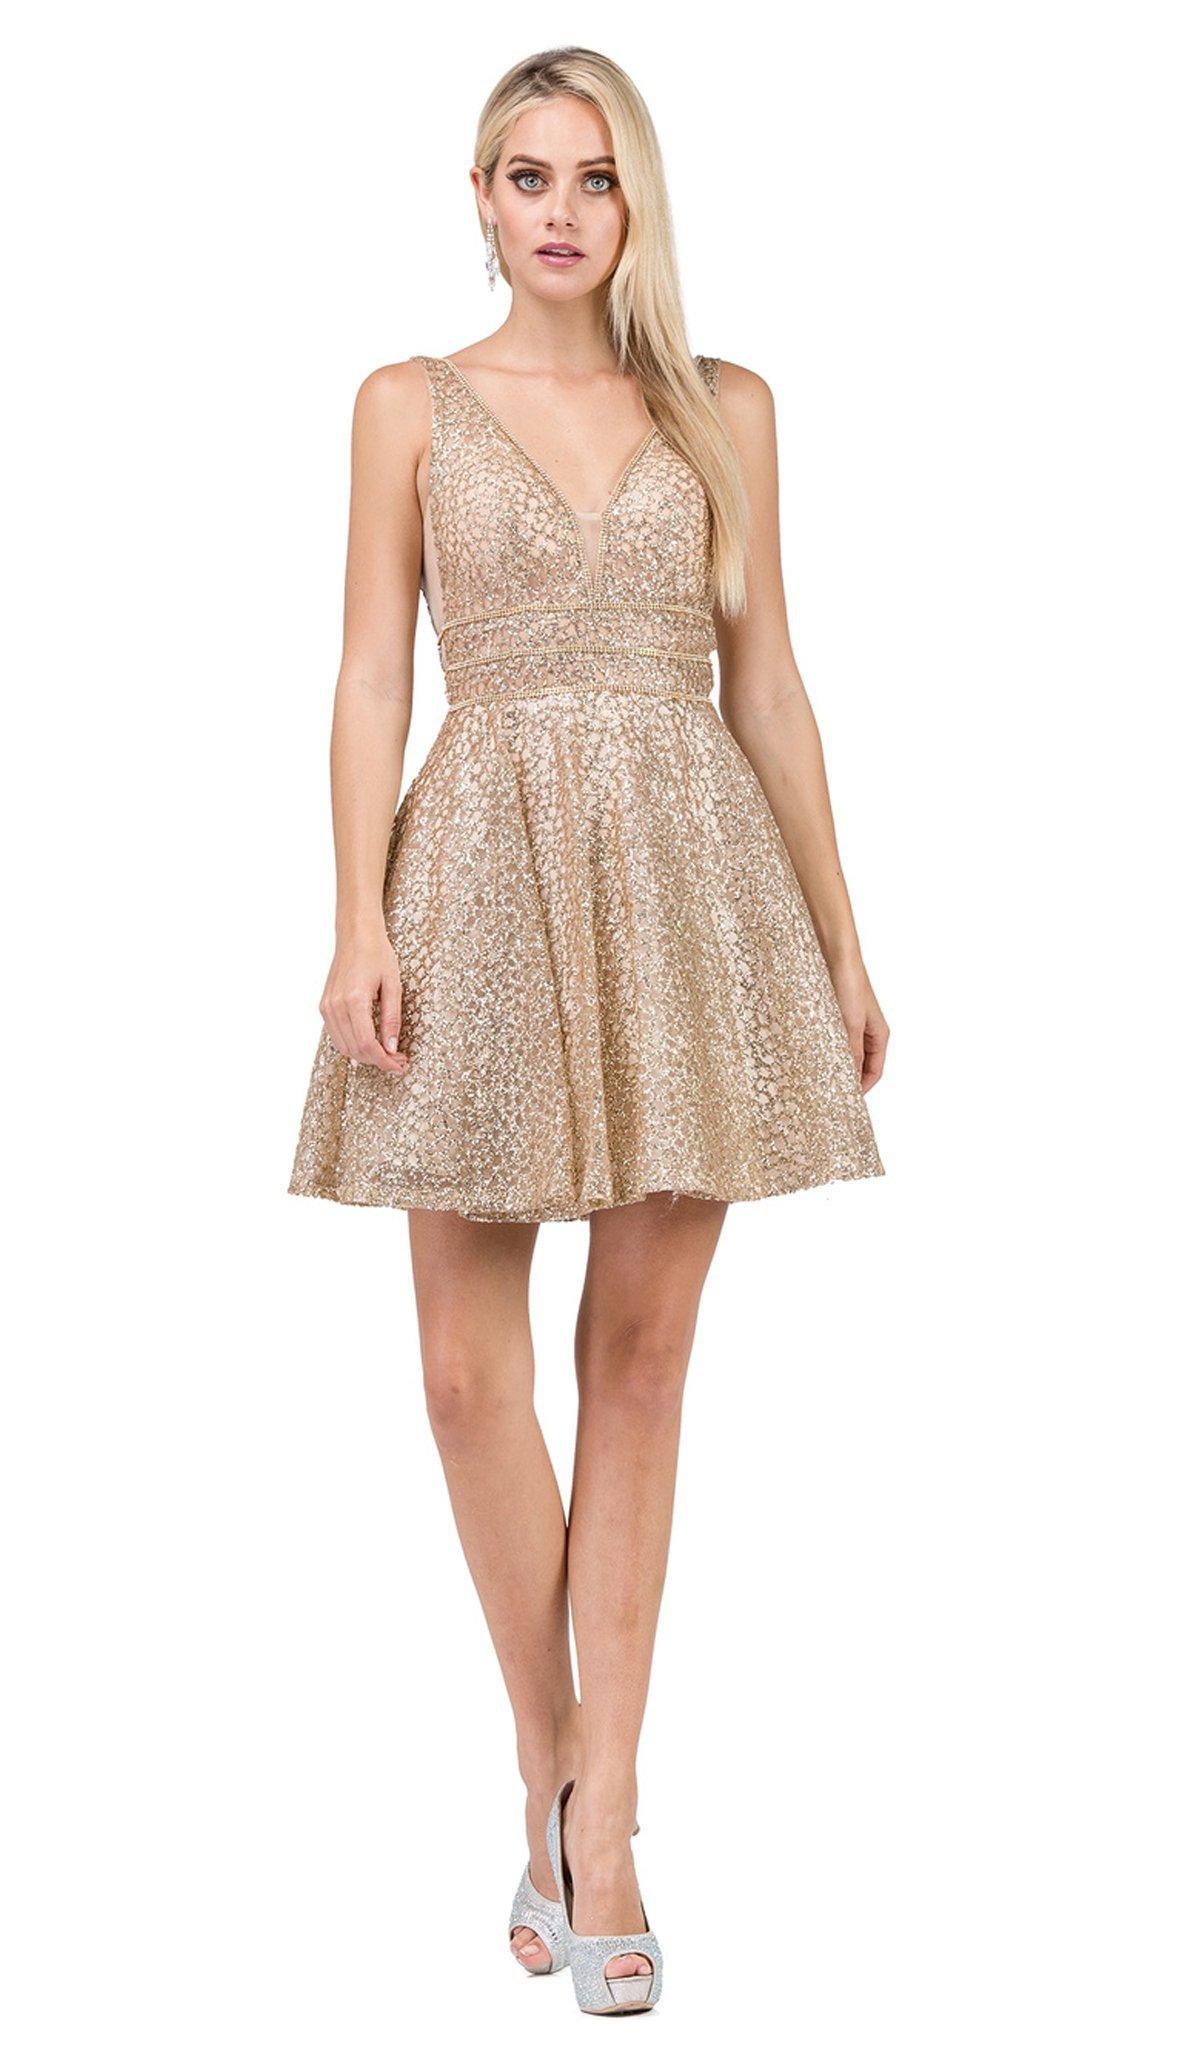 Dancing Queen - 3086 Illusion Cutout Sleeveless V Neckline Party Dress